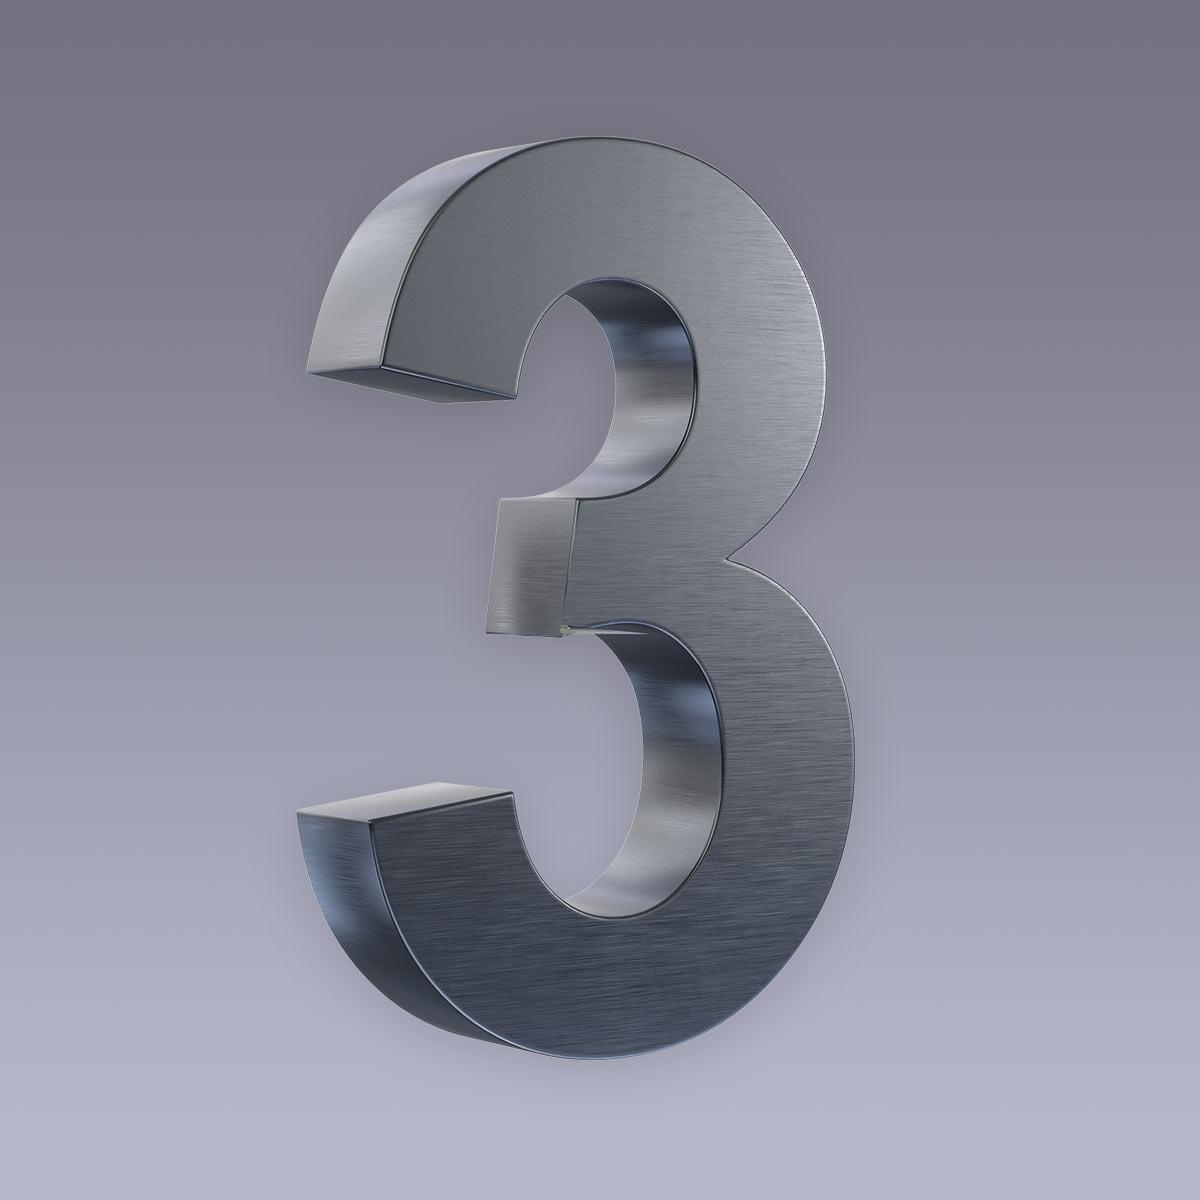 3D Hausnummer 3 Edelstahl anthrazit RAL7016 in 3D Design Arial